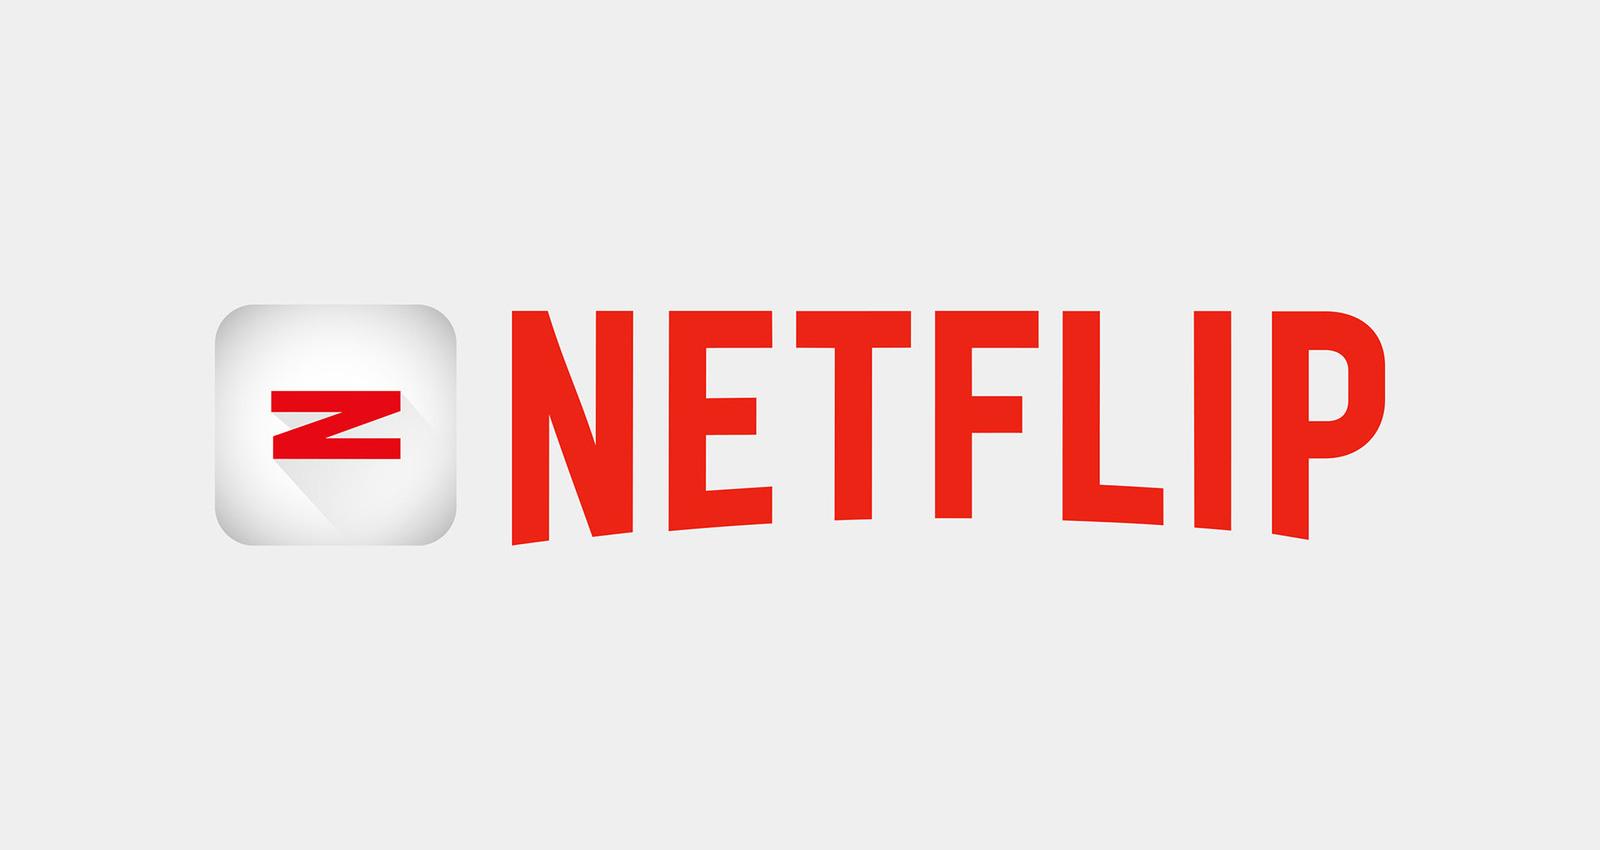 Netflix Netflip